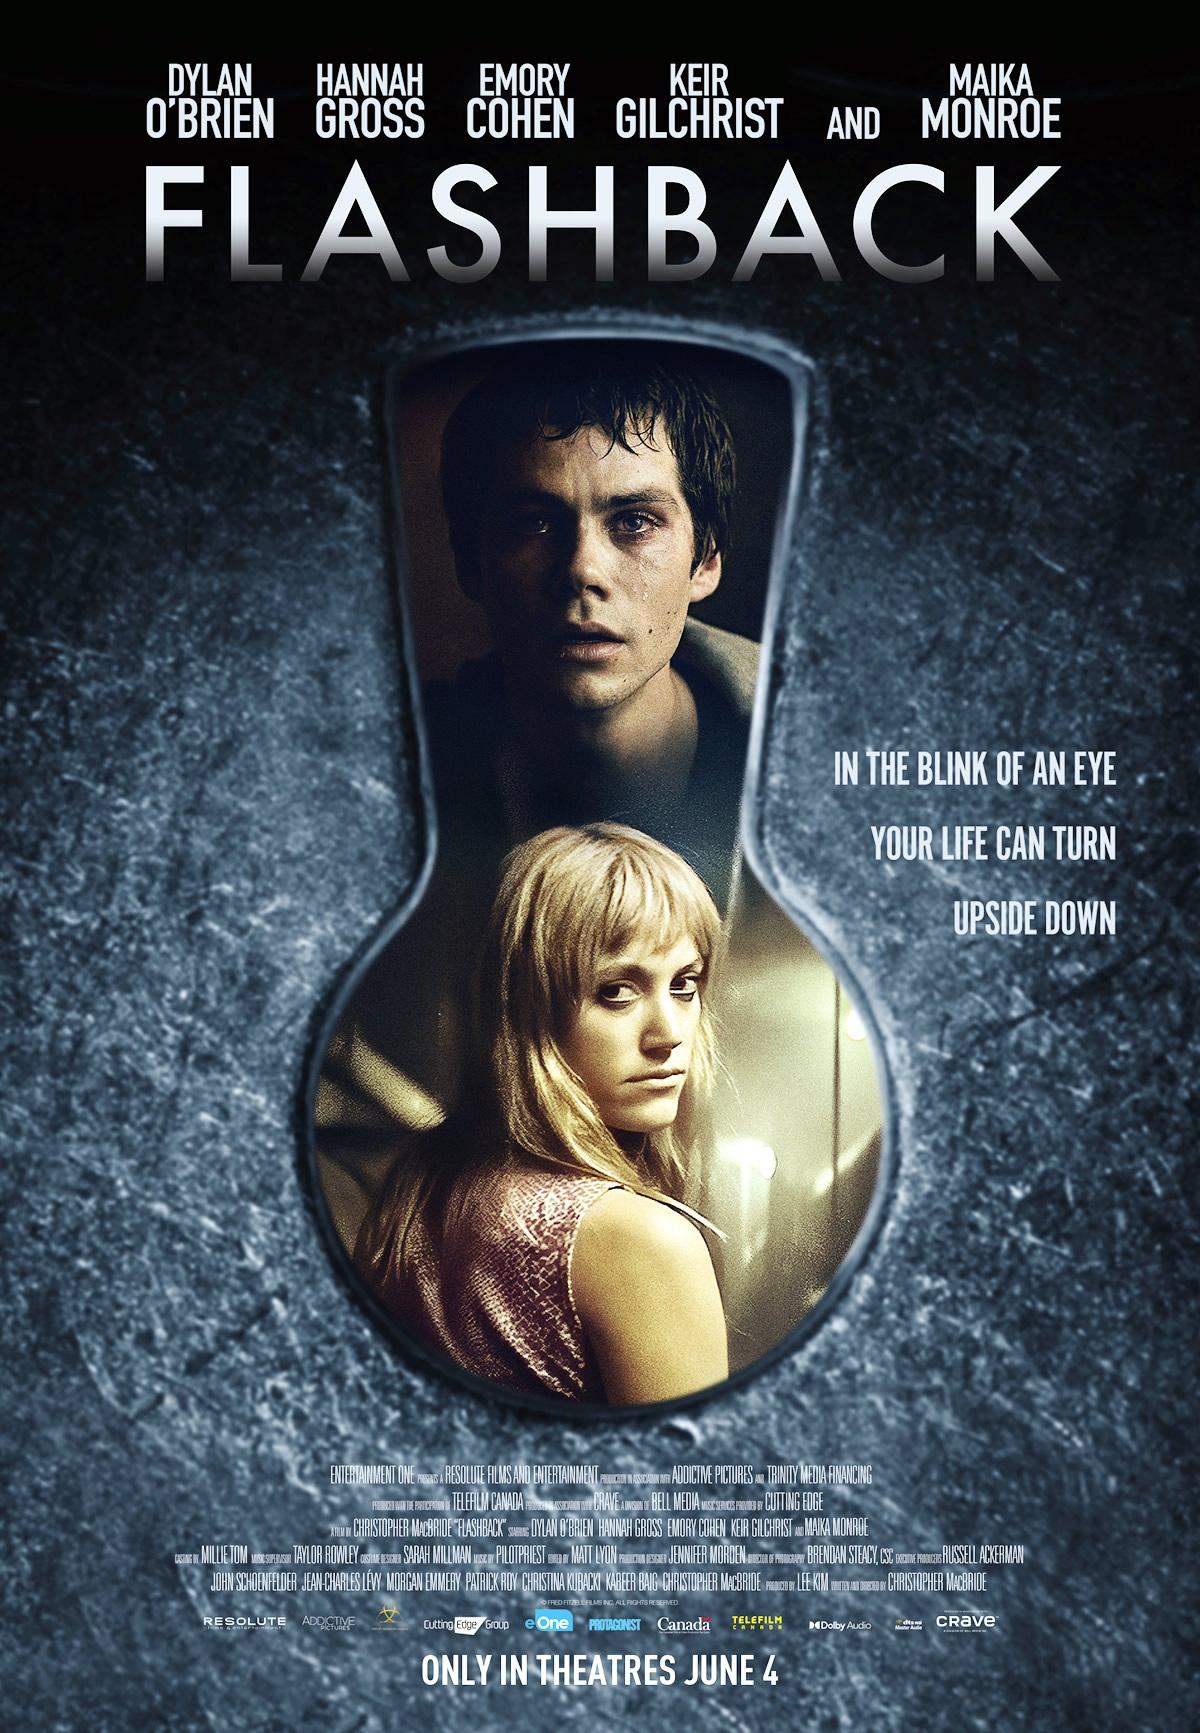 FLASHBACK | Thriller psicológico estrelado por Dylan O'Brien onde passado, presente e futuro se entrelaçam